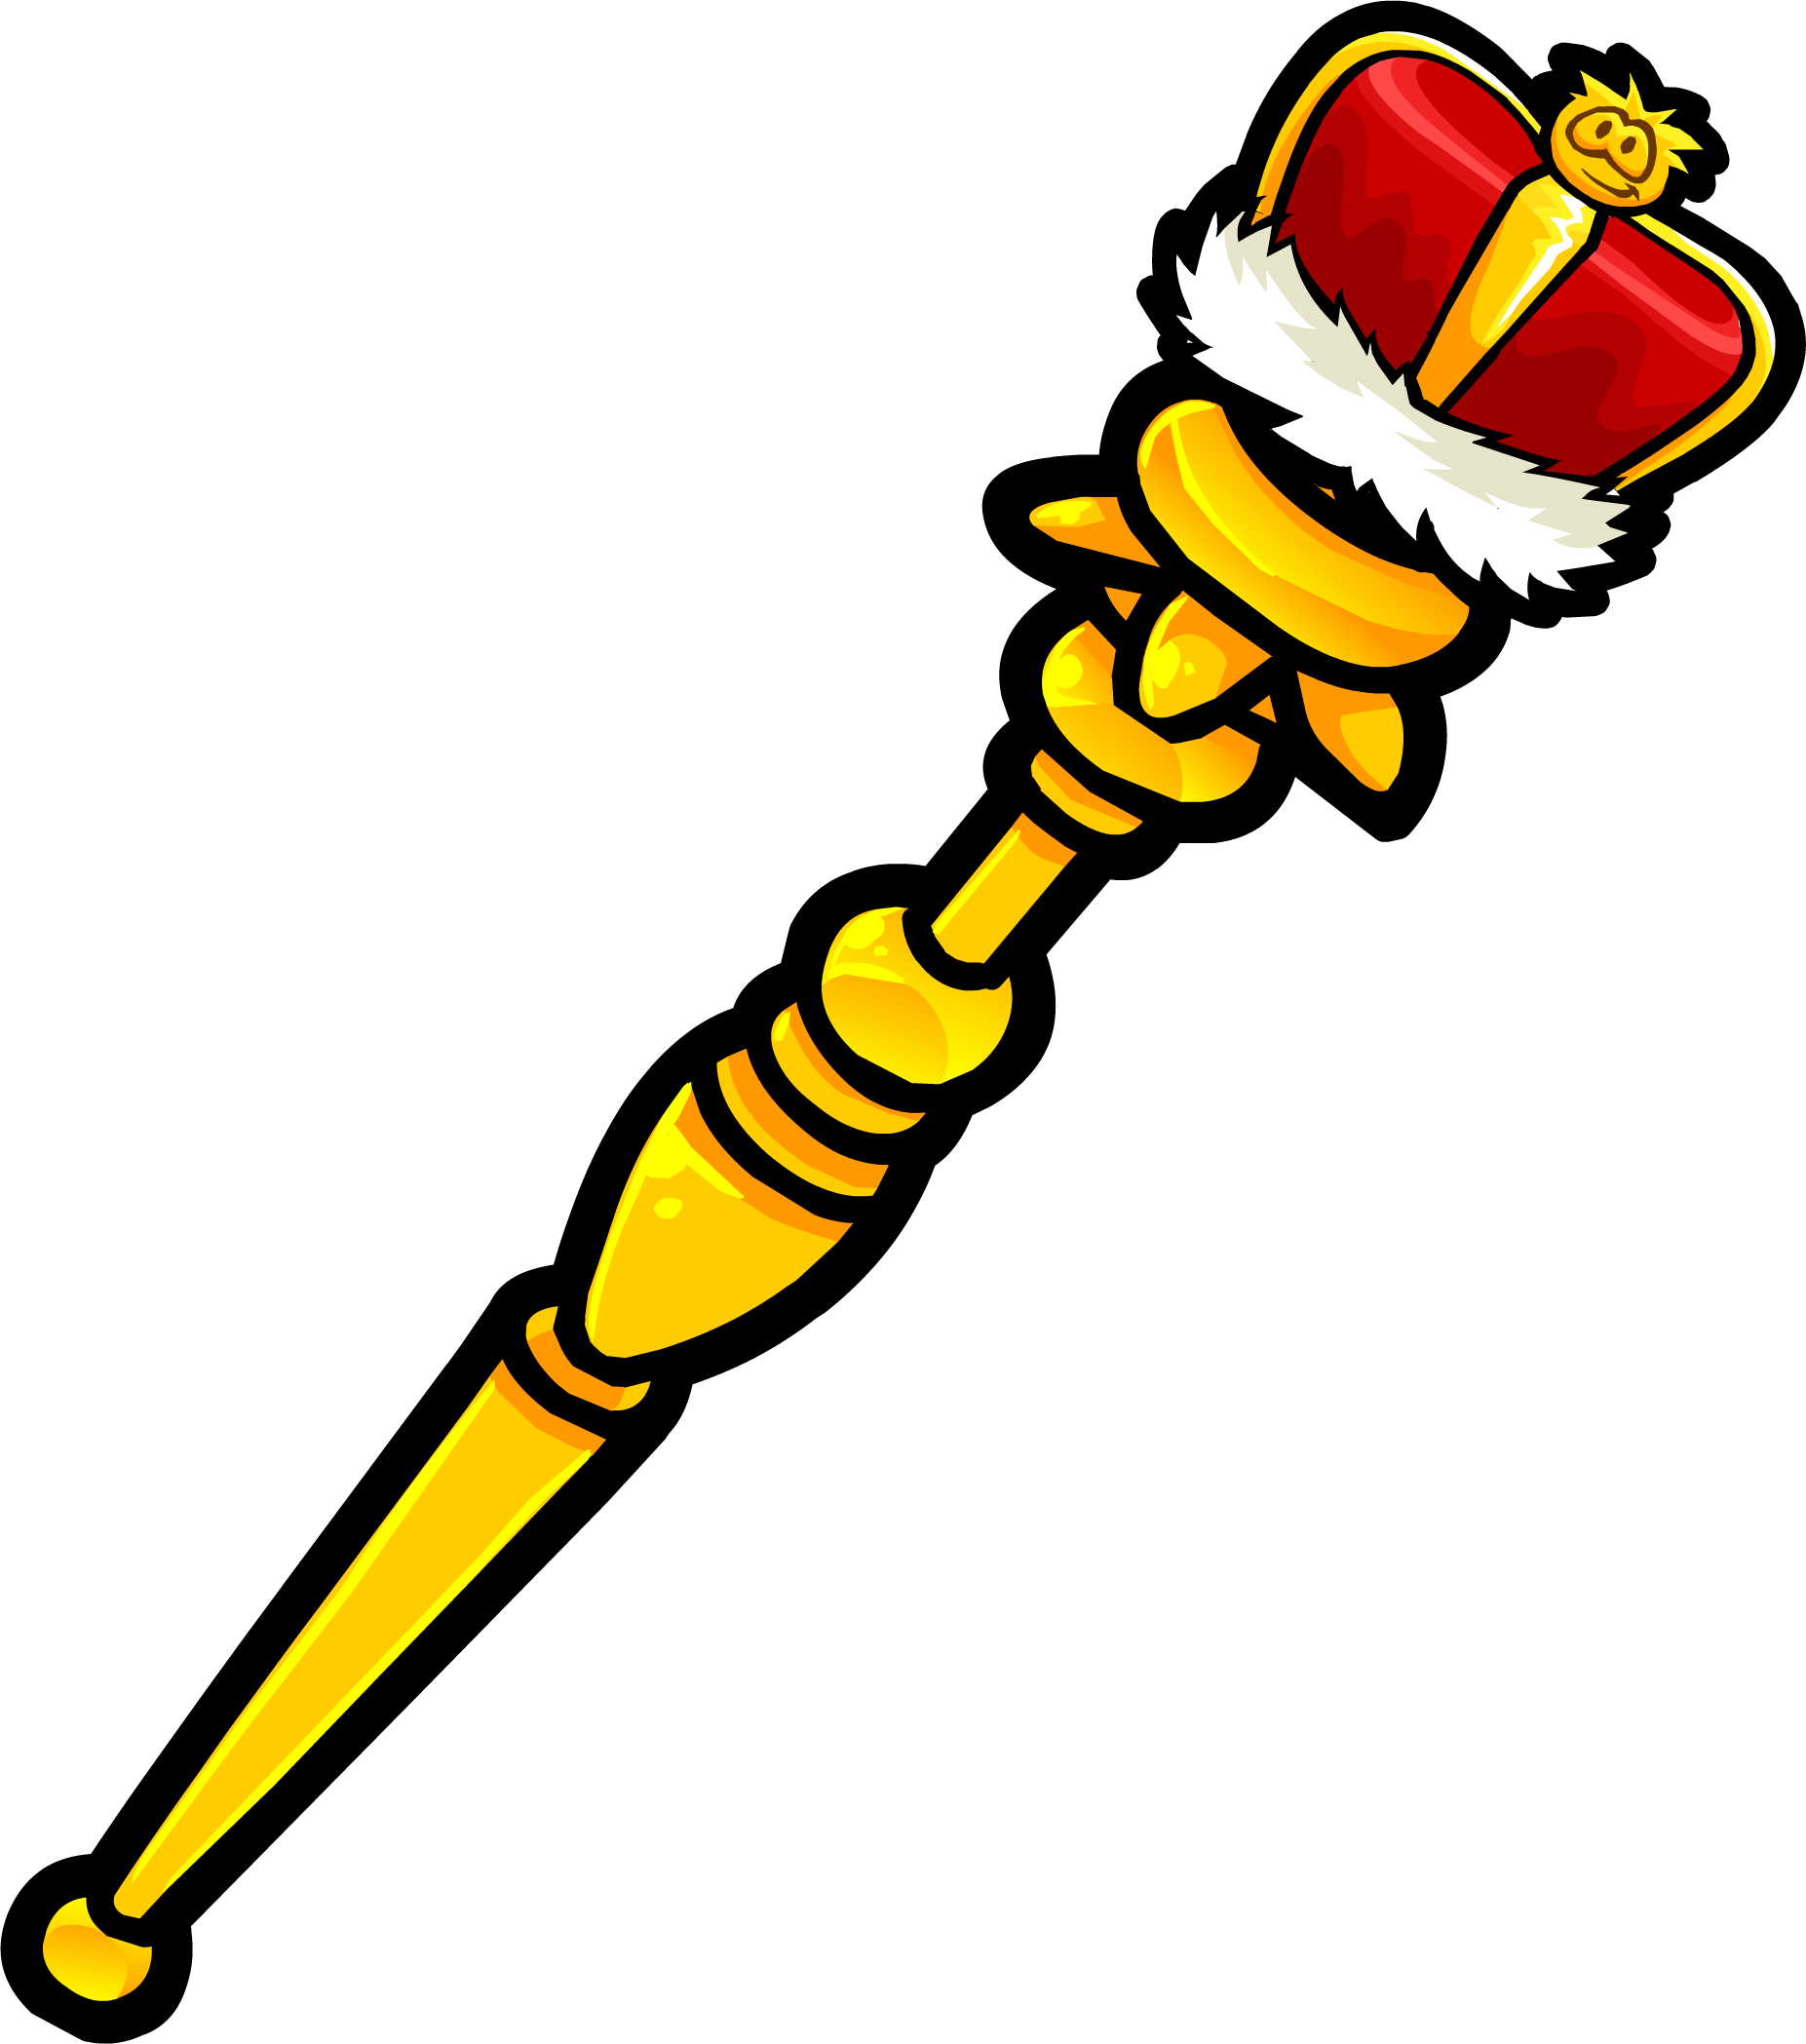 Royal club penguin rewritten. King clipart scepter